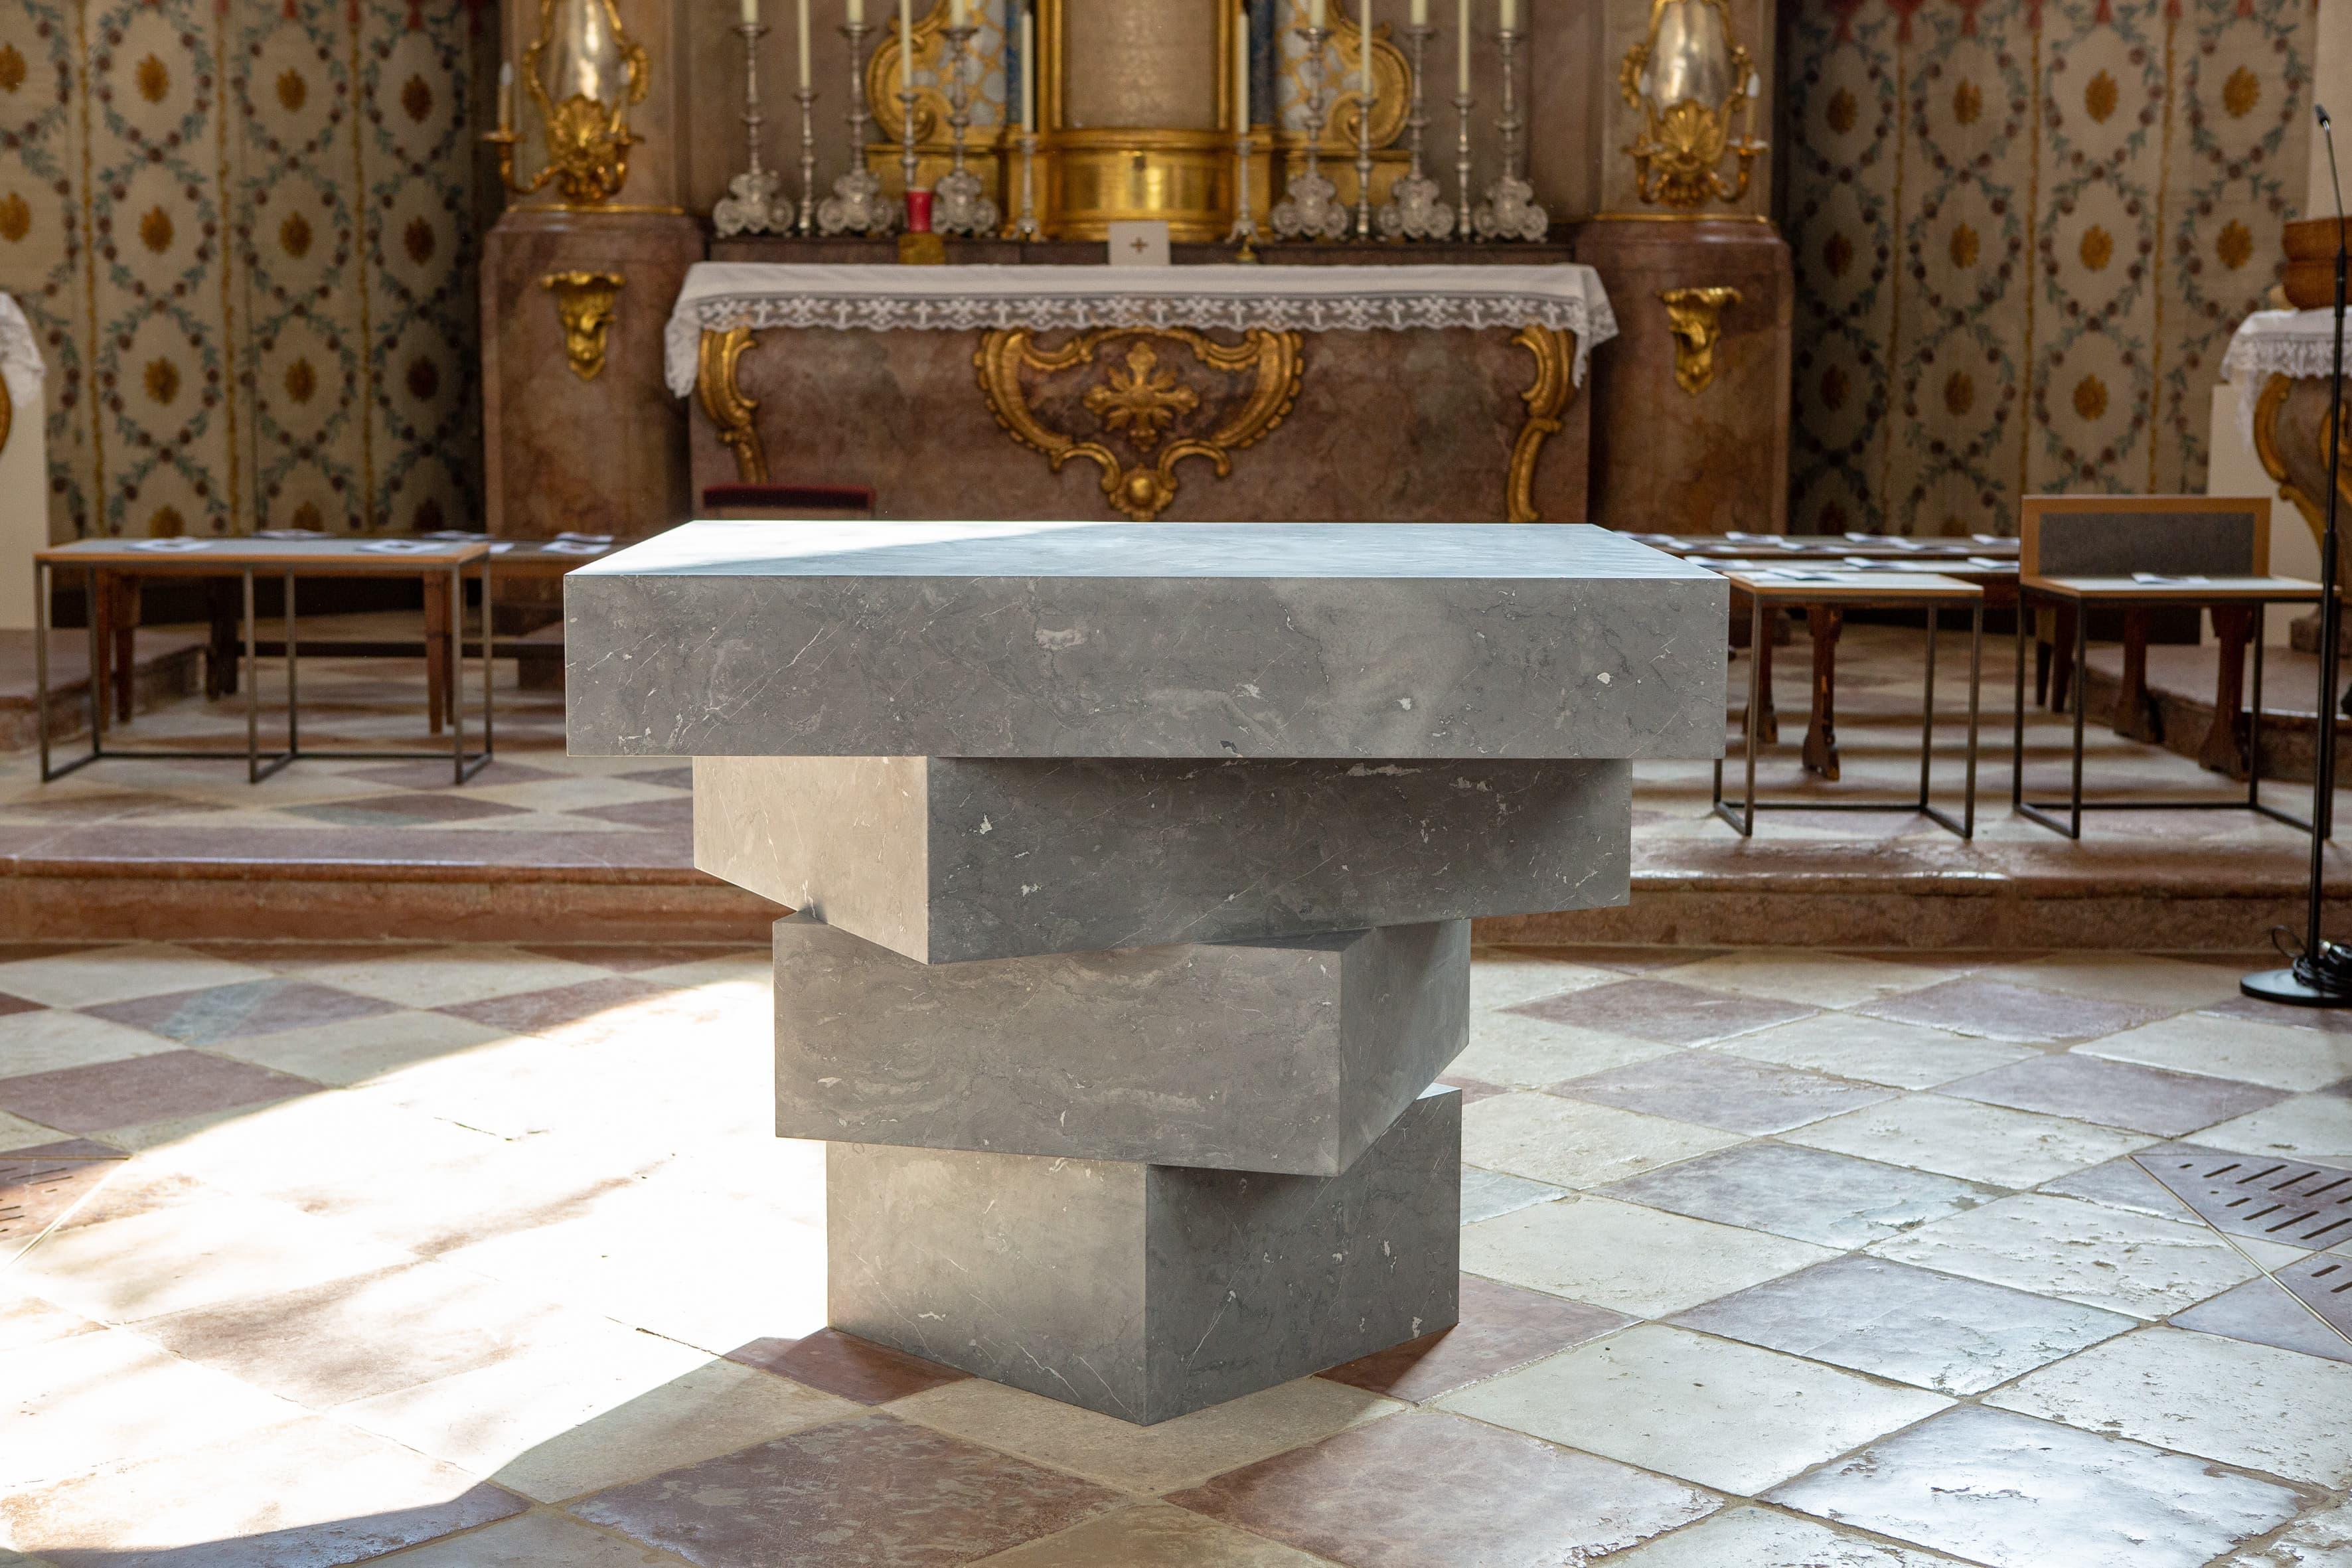 Pfarrkirche Mariä Himmelfahrt Bad Aibling Altar groß